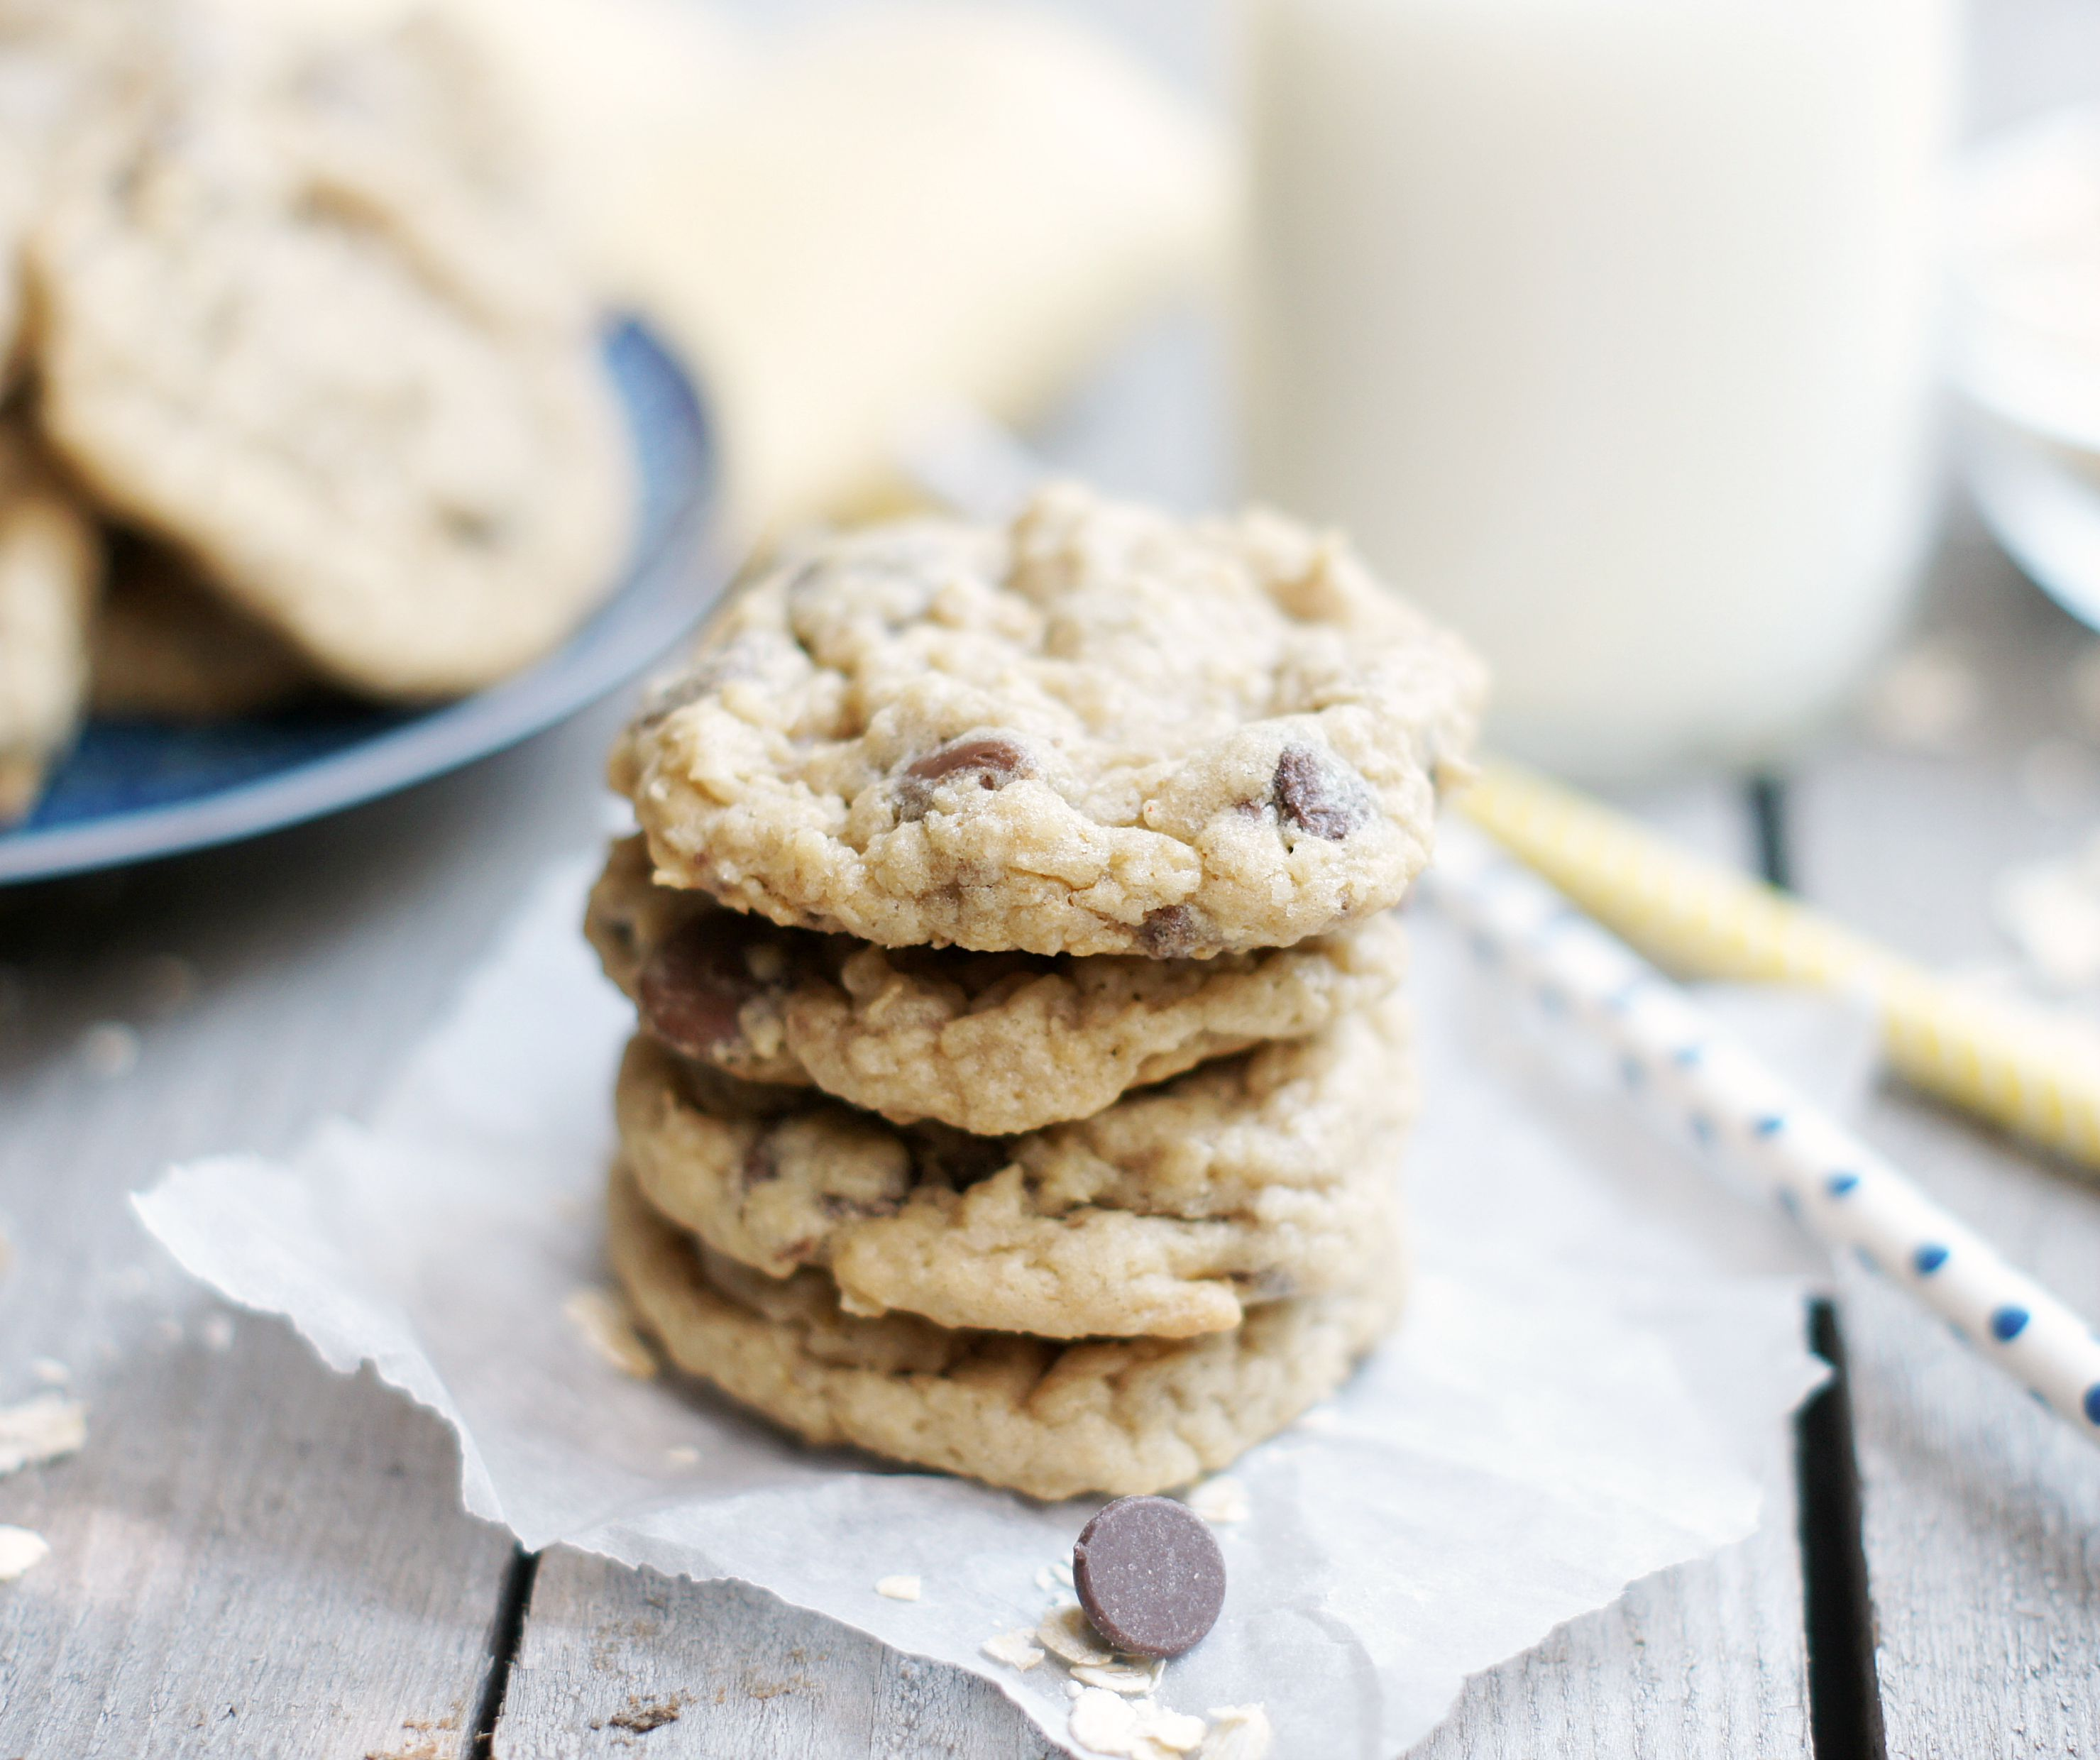 Paradise bakery chocolate chip cookie recipe